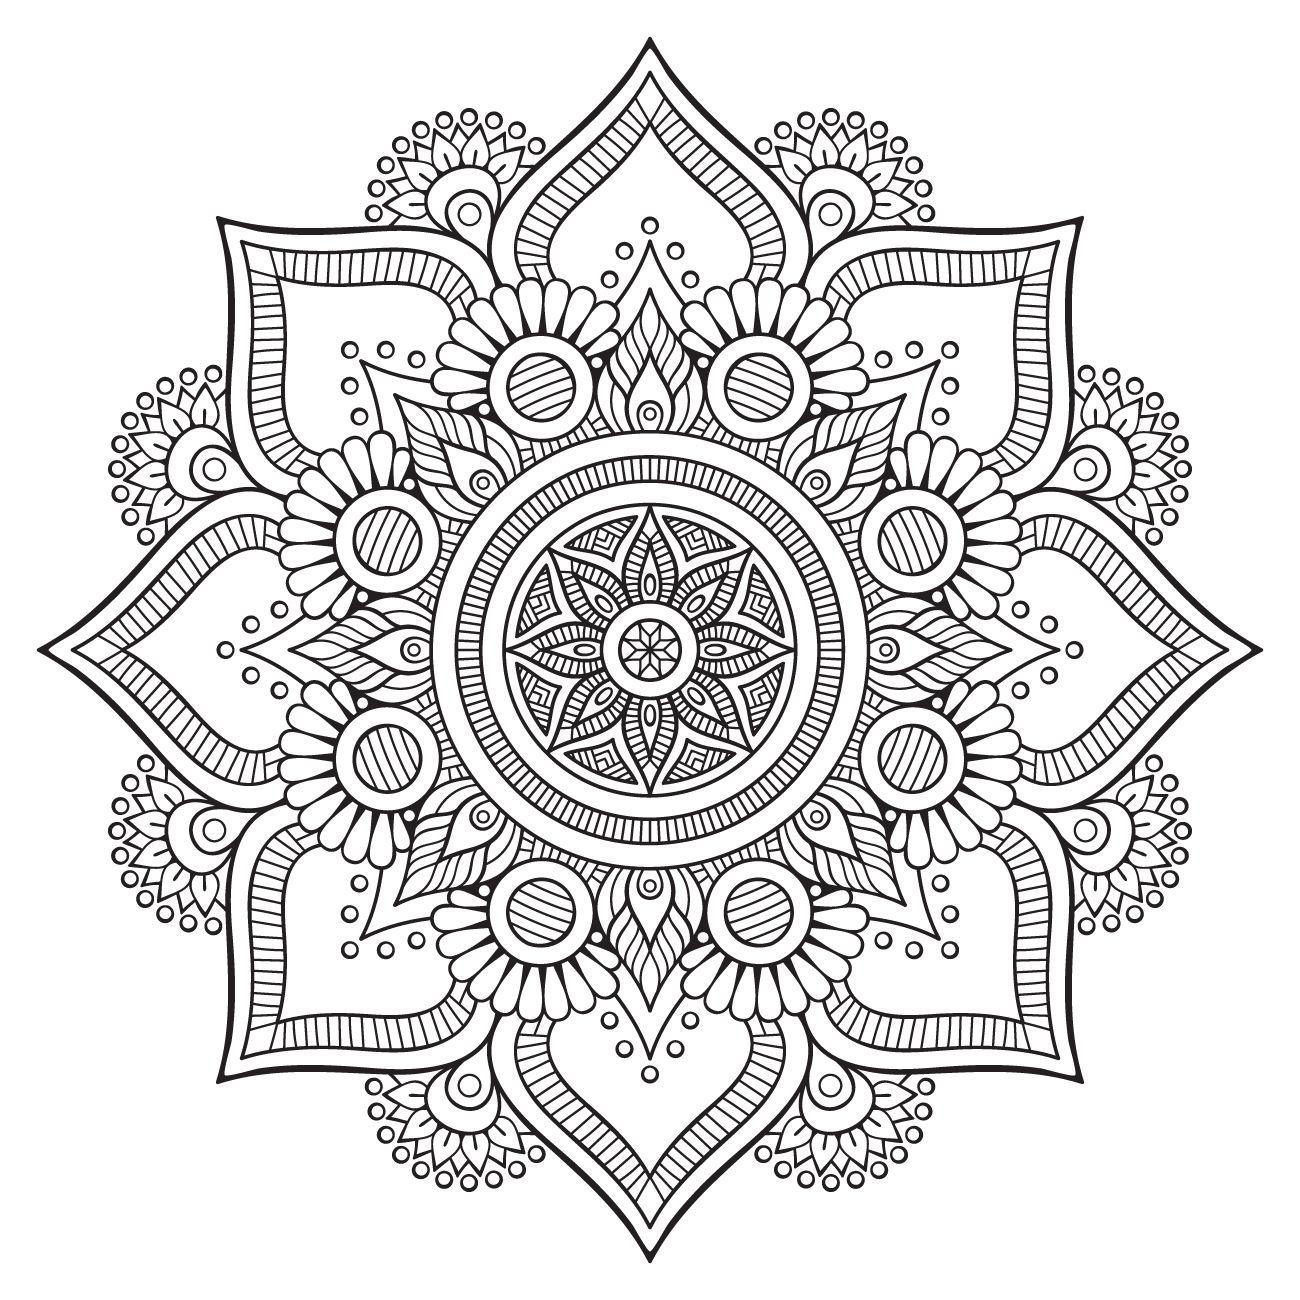 3614 1 Jpg Mandala Coloring Pages Mandala Coloring What Is A Mandala